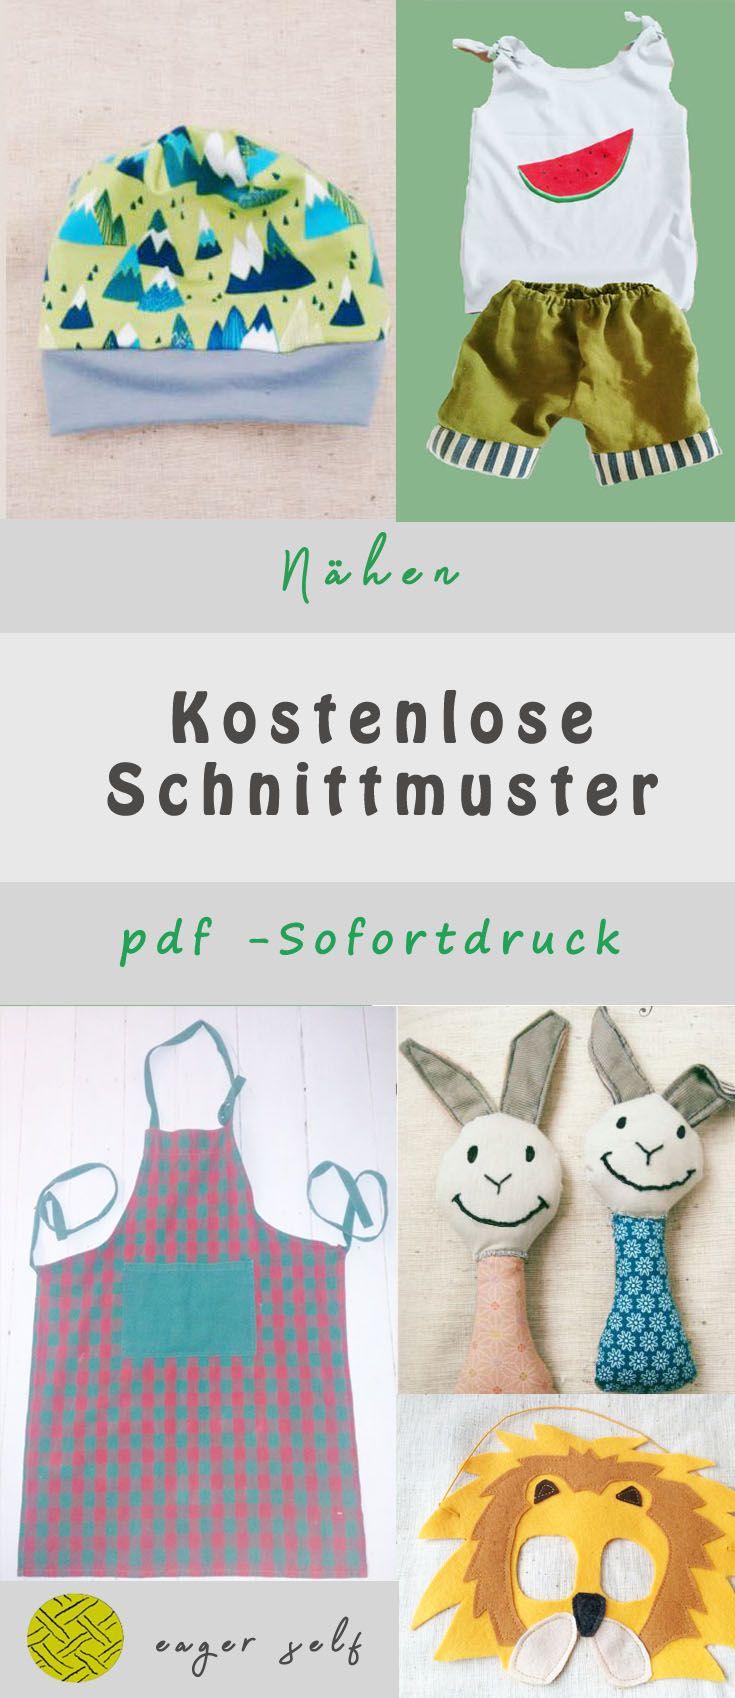 Kostenlose Schnittmuster pdf download | Nähen | Pinterest ...